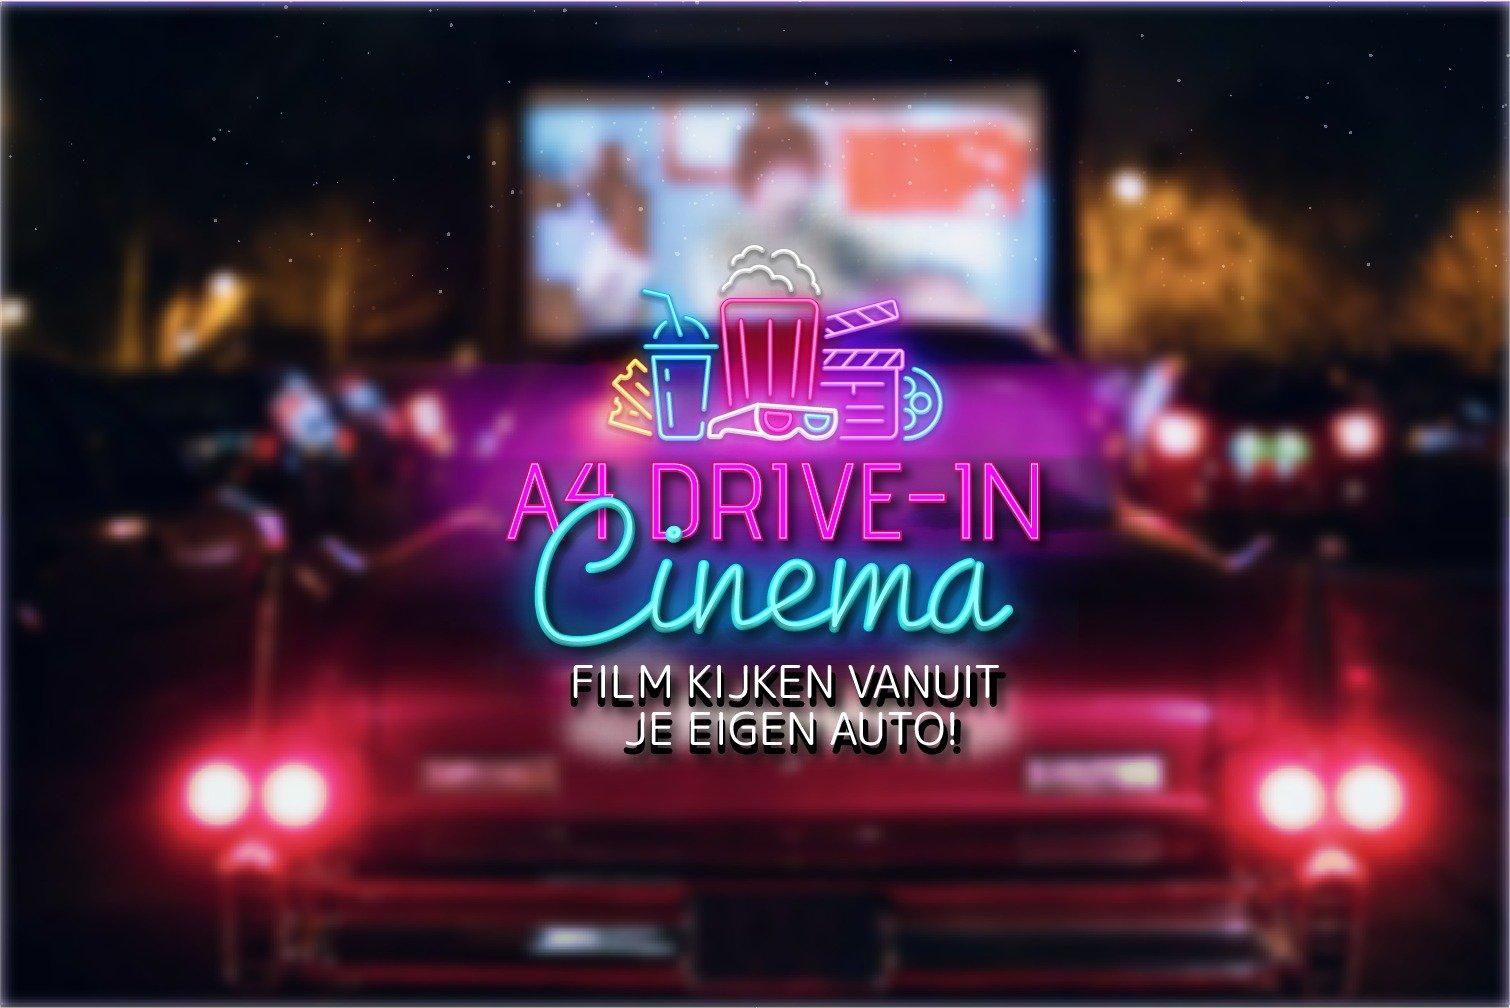 Drive-in bioscoop: Dirty Dancing